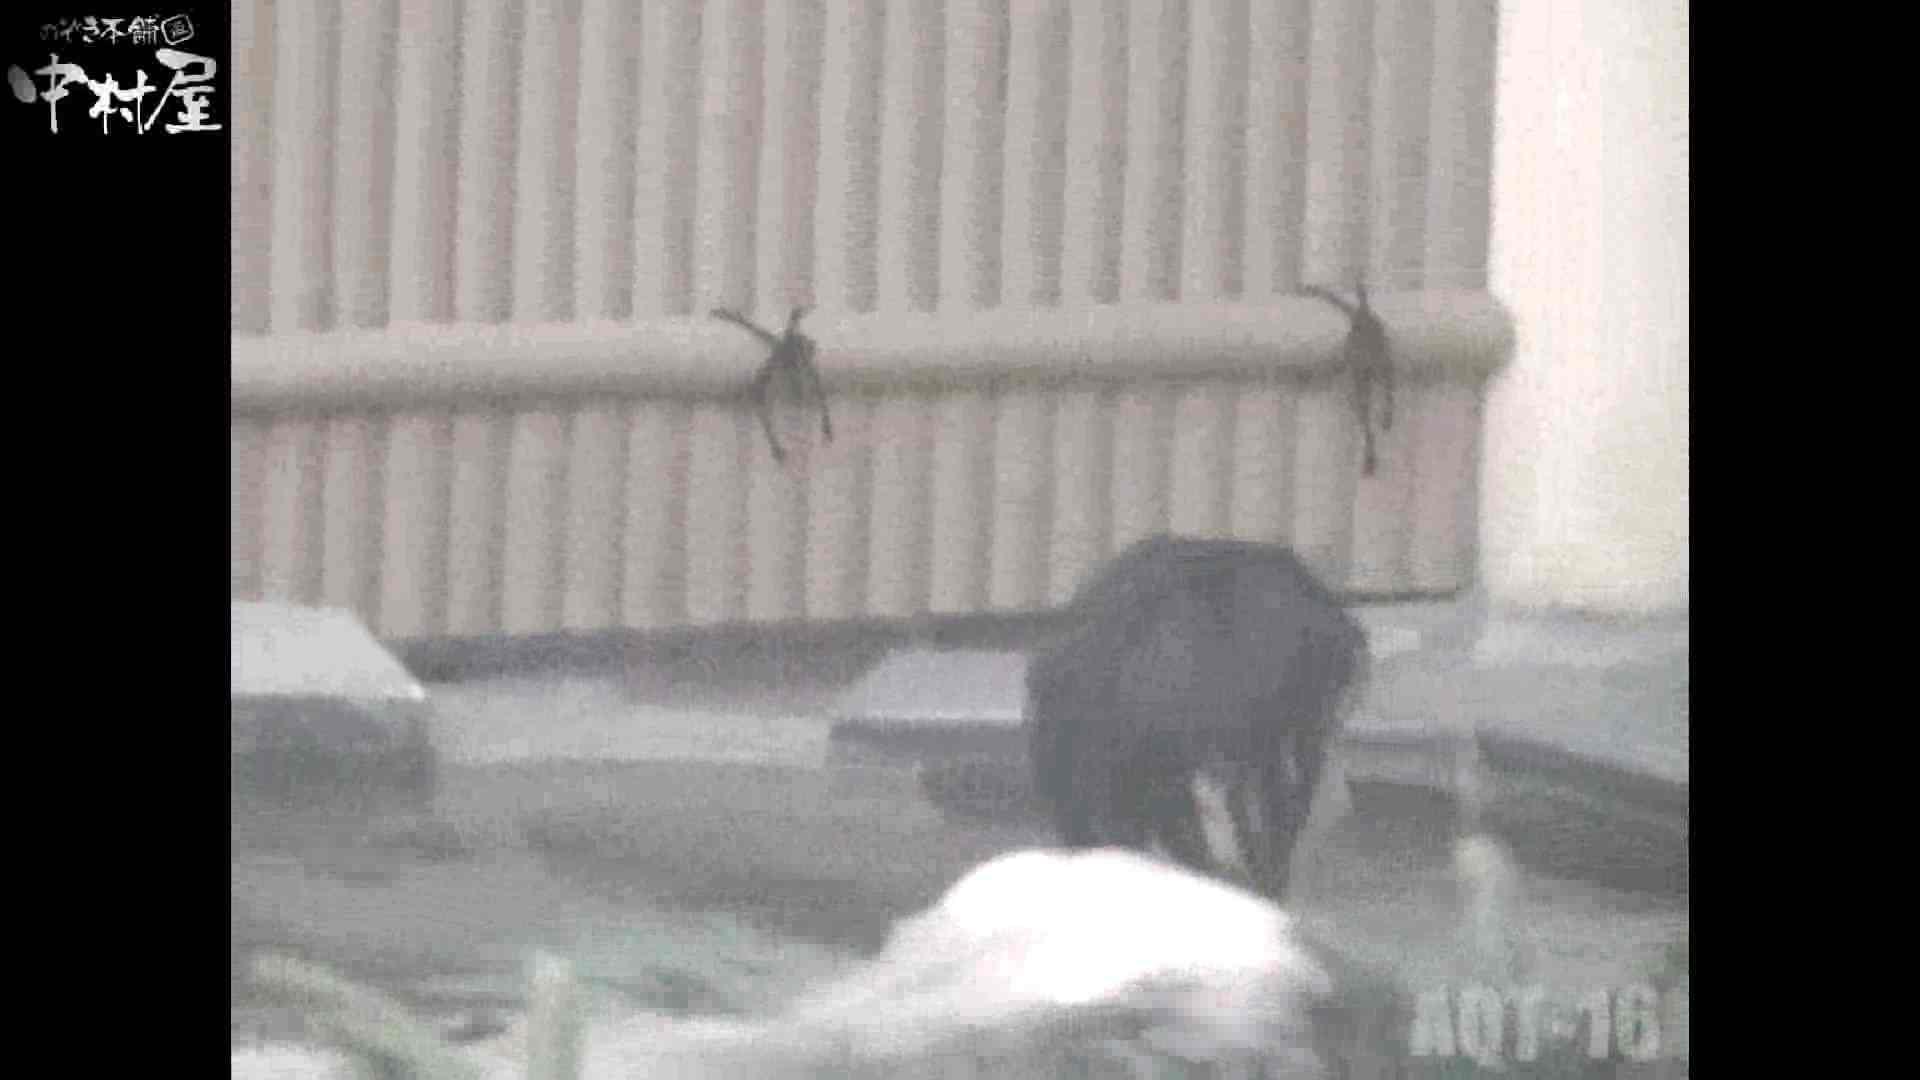 Aquaな露天風呂Vol.880潜入盗撮露天風呂十六判湯 其の八 潜入 おまんこ動画流出 99PIX 47